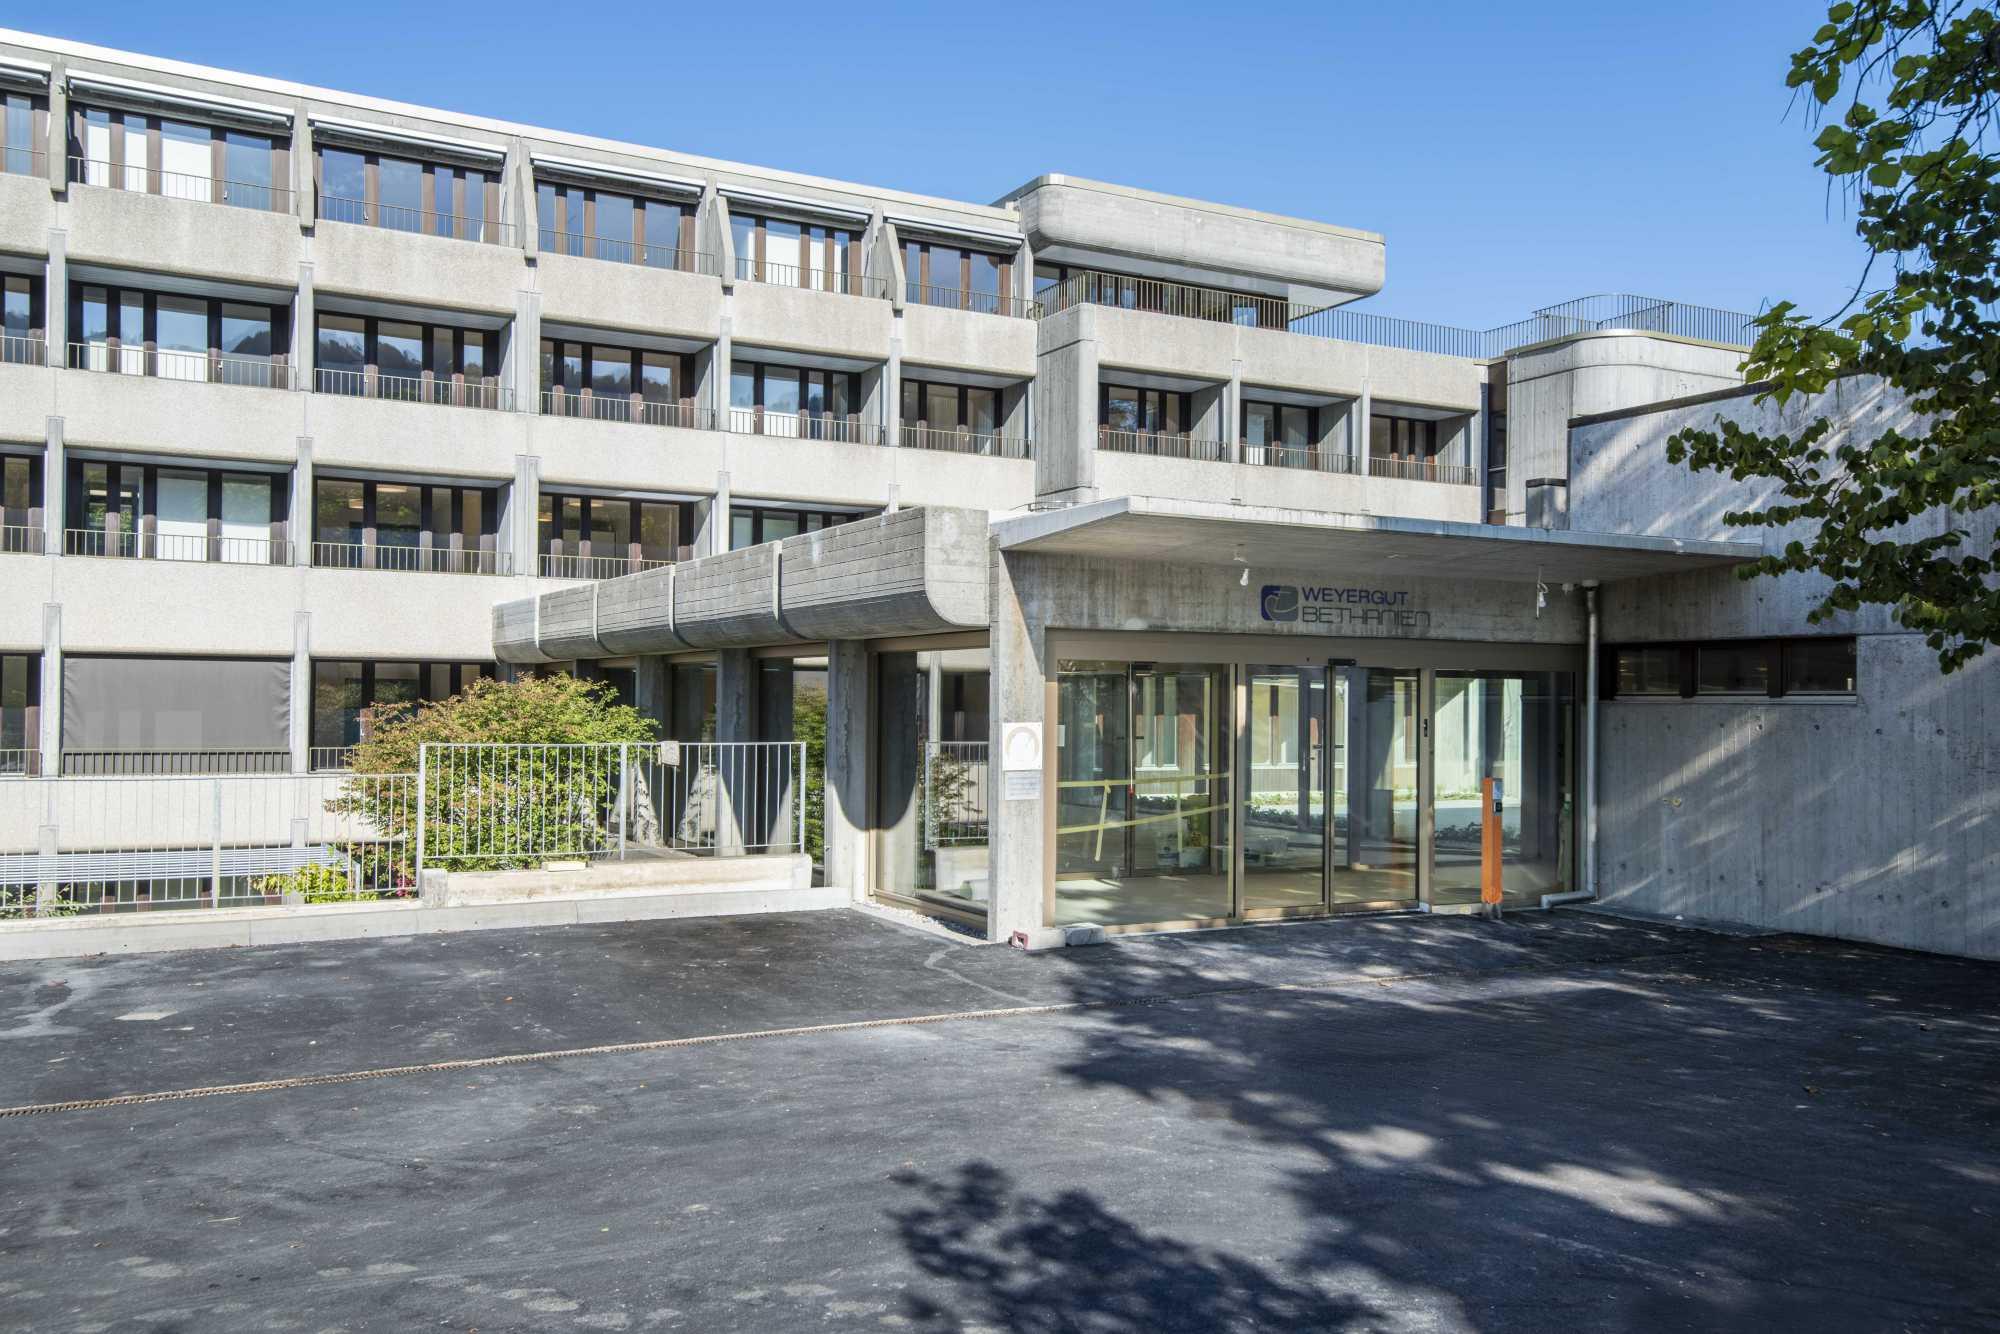 Projektbild-Nr. 0: Zentrum Weyergut/Diakonie